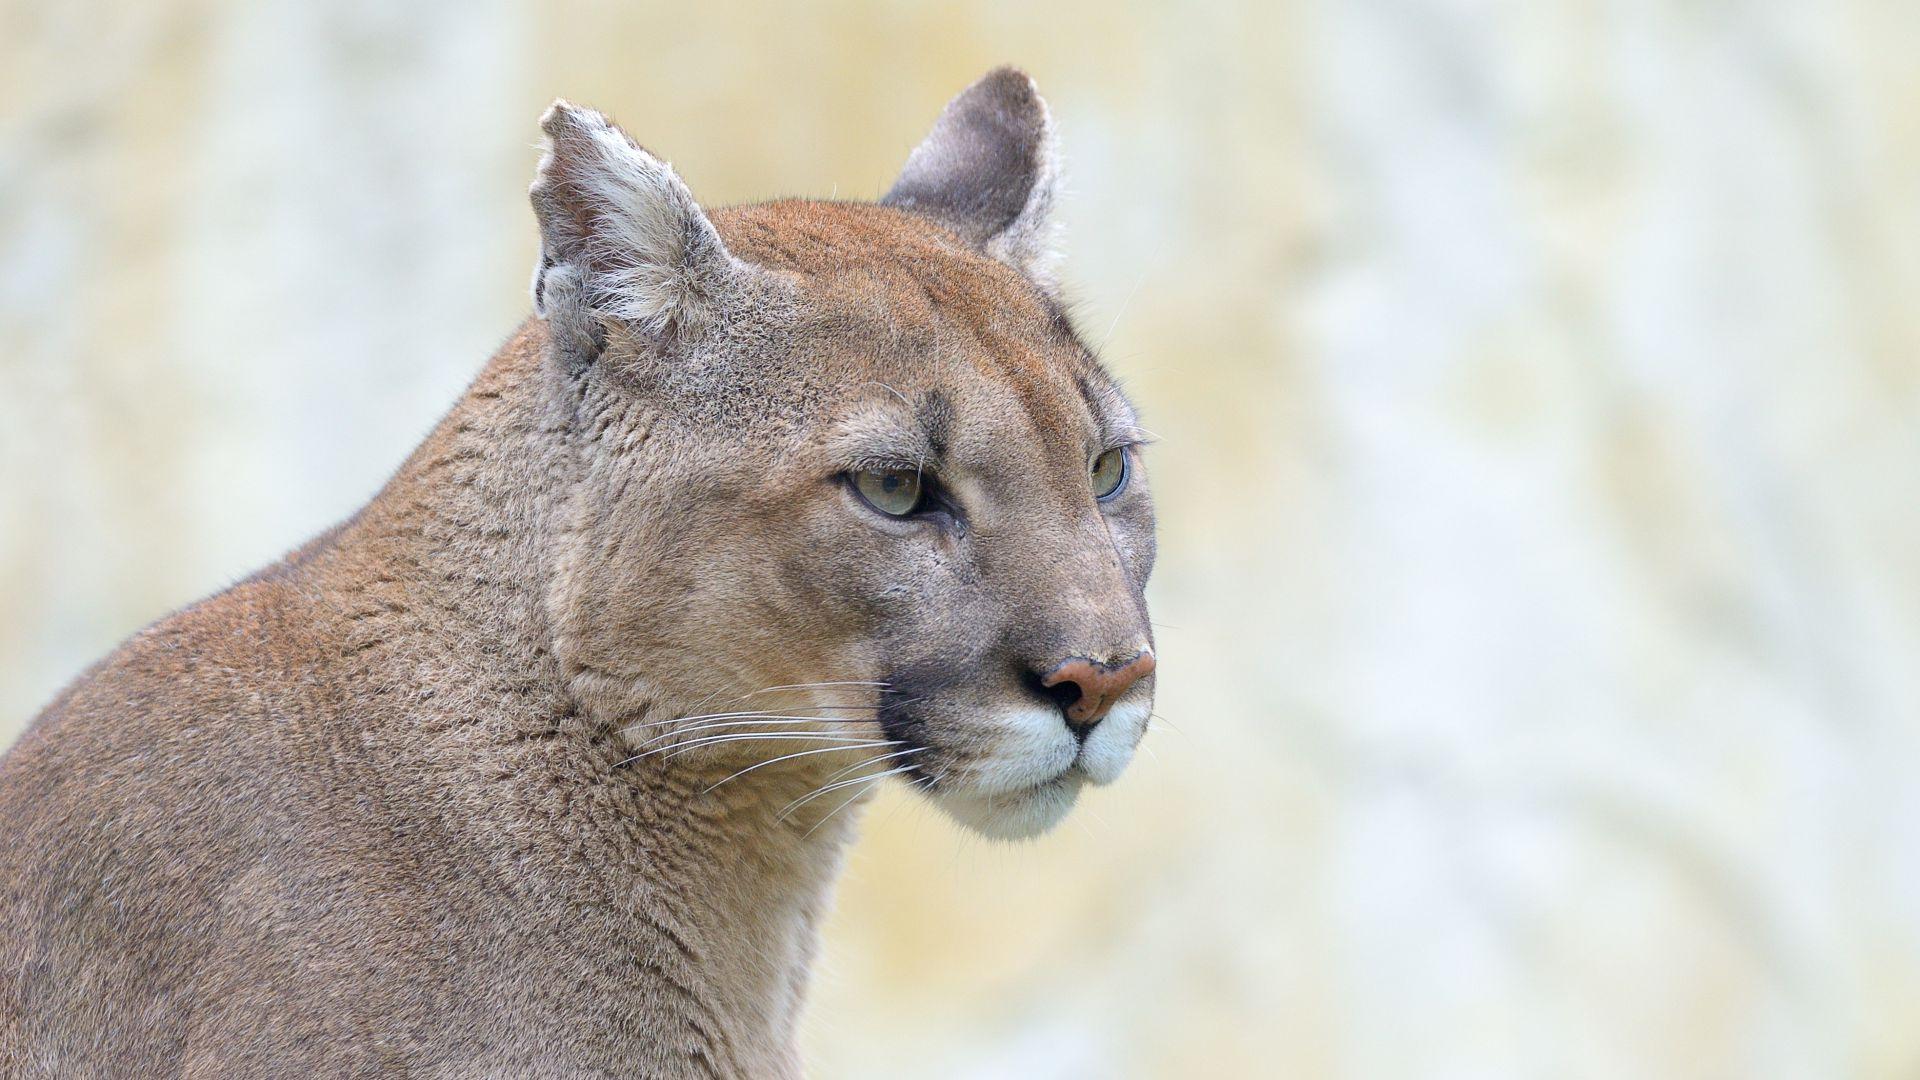 Puma : taille, description, biotope, habitat, reproduction